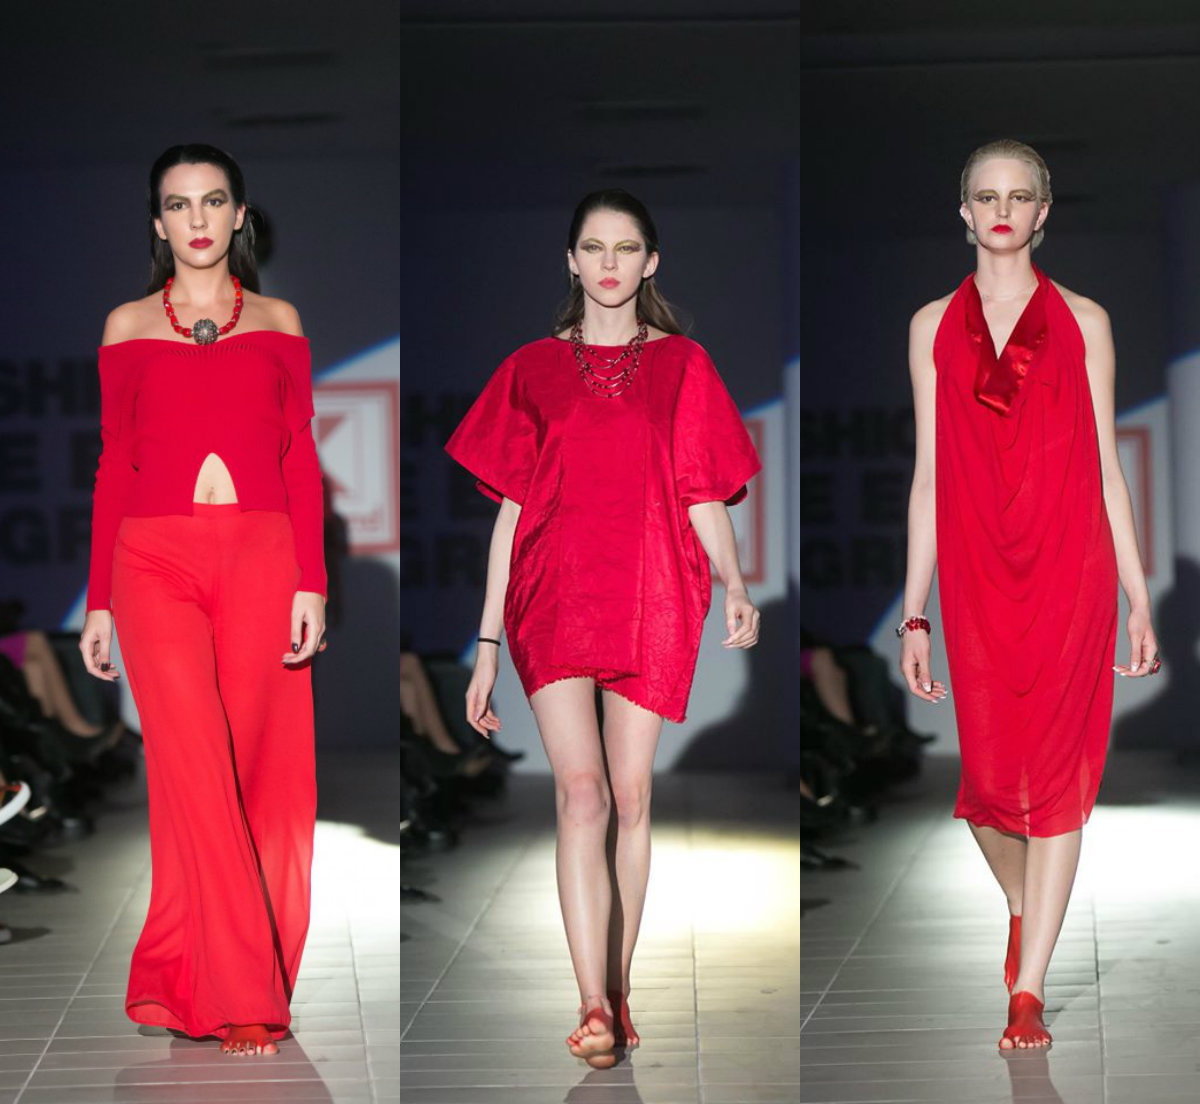 Summer 2016 Fashion Week Zagreb - Simone Manojlović